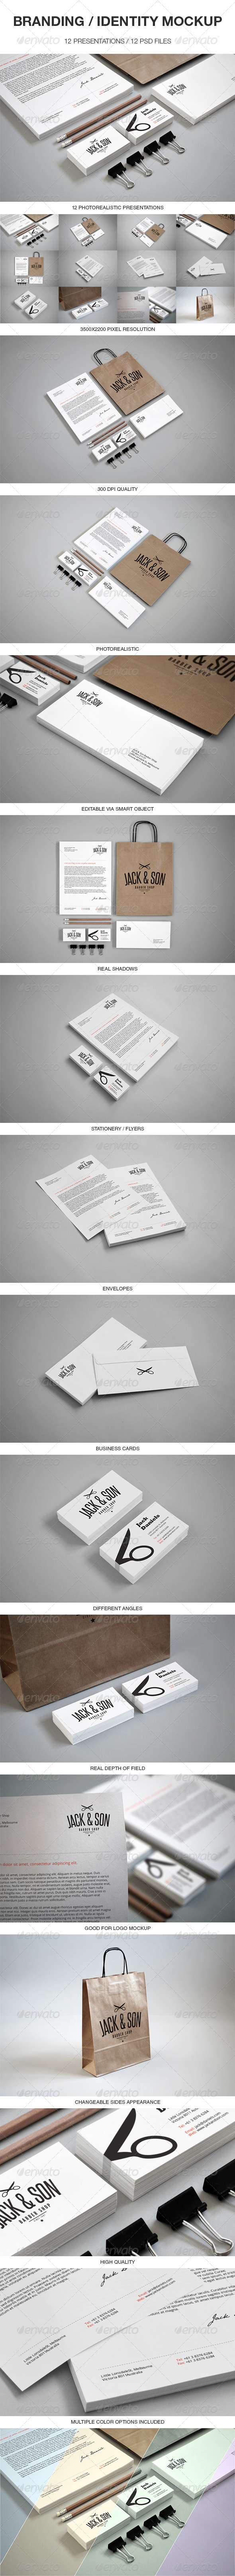 Branding / Identity Mockup - Print Product Mock-Ups